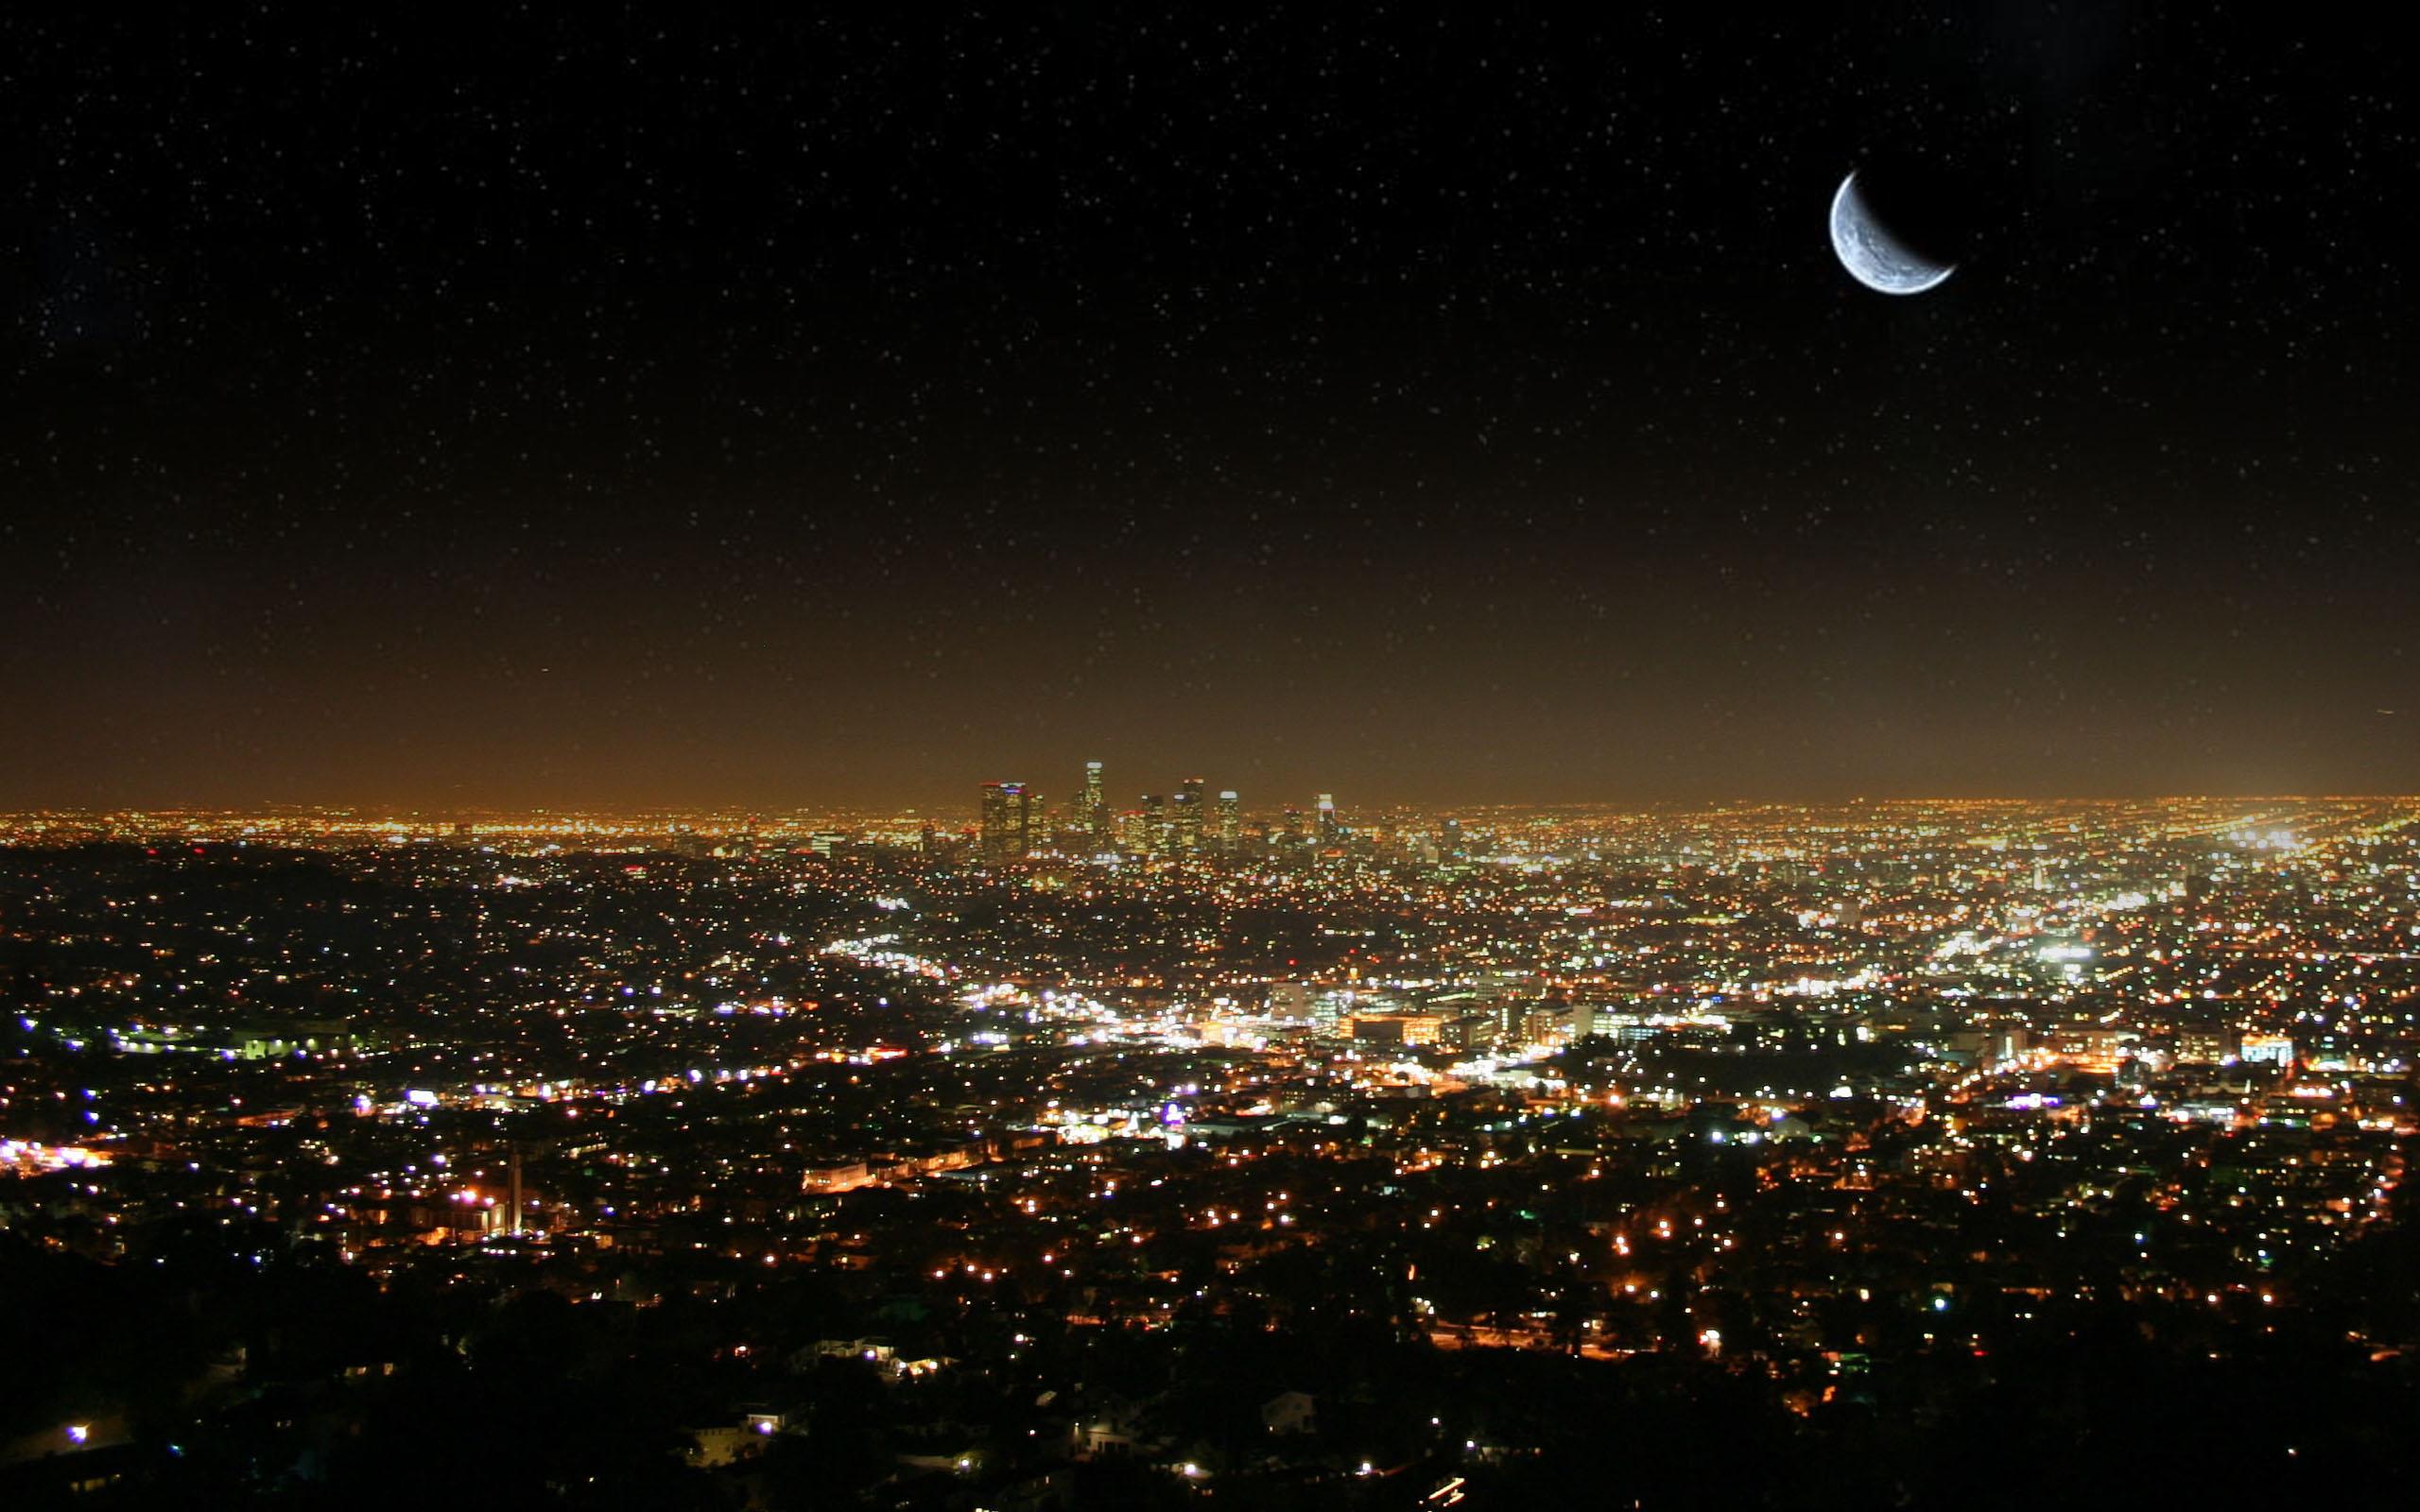 Hd wallpaper night - Hd Wallpaper Night La Los Angeles Desktop Wallpaper Wallpapers Hd Usa America